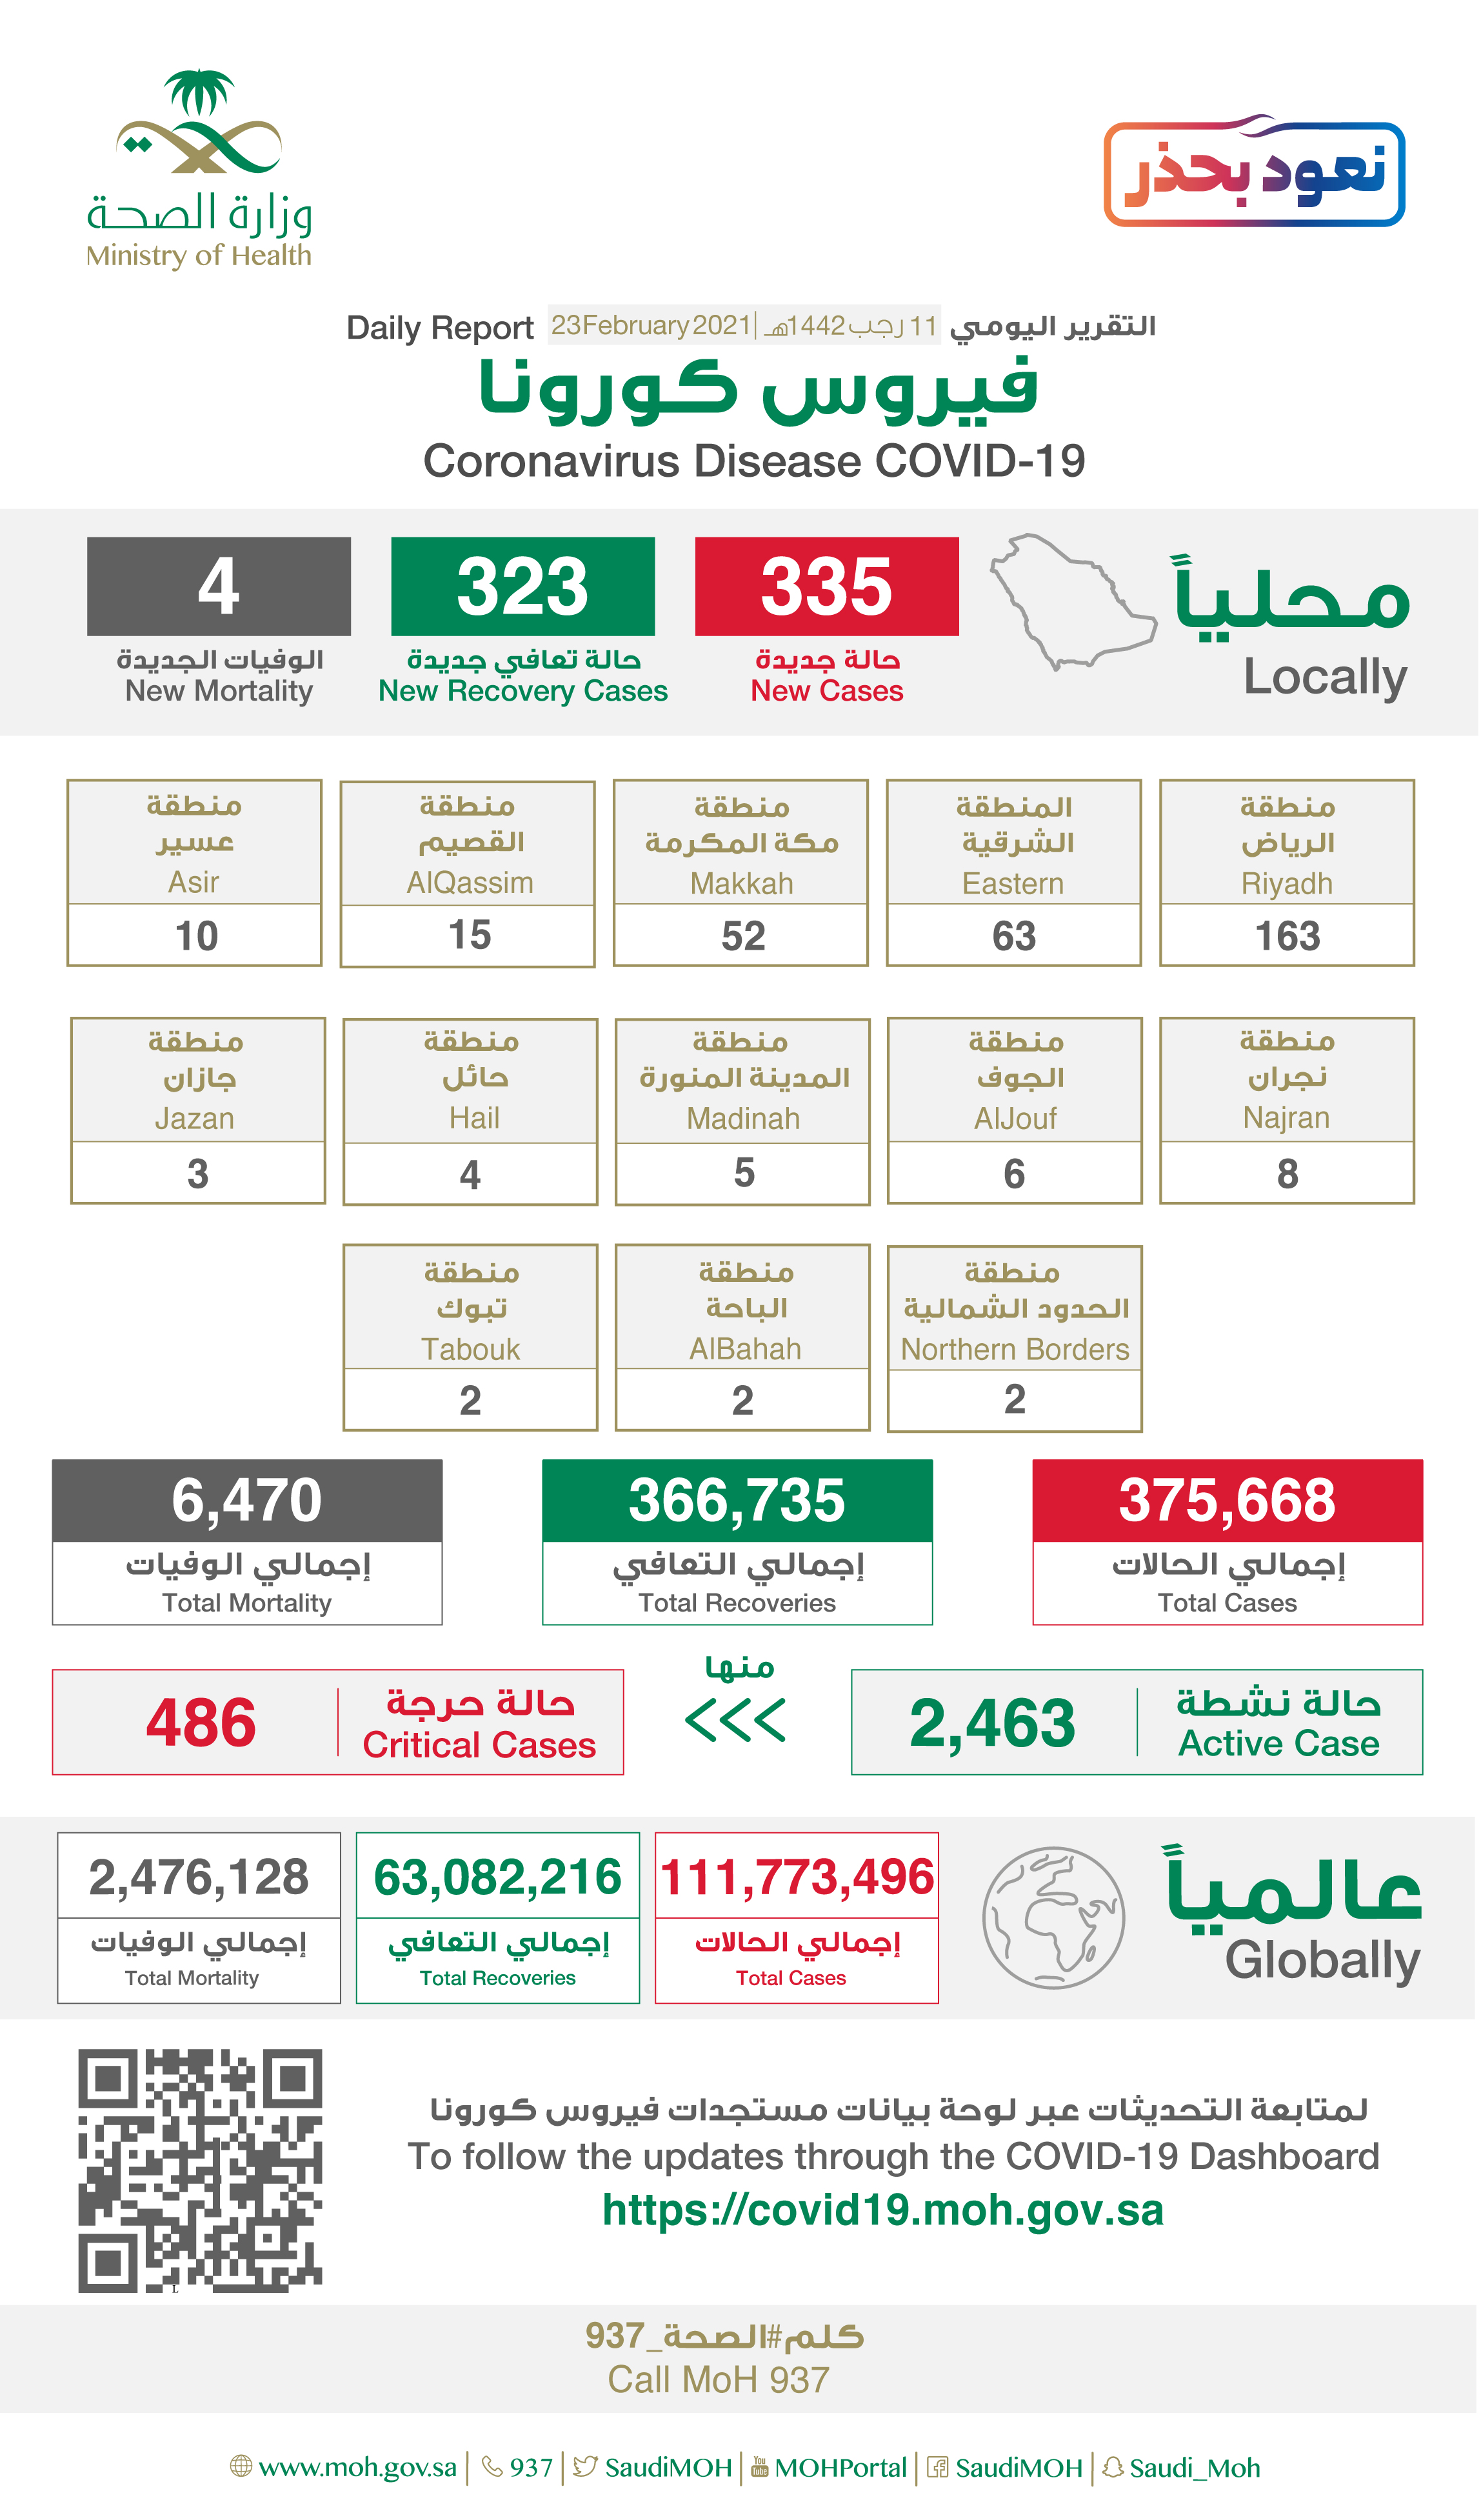 Saudi Arabia Coronavirus : Total Cases :375,668 , New Cases : 335, Cured : 366,735 , Deaths: 6,470, Active Cases : 2,463